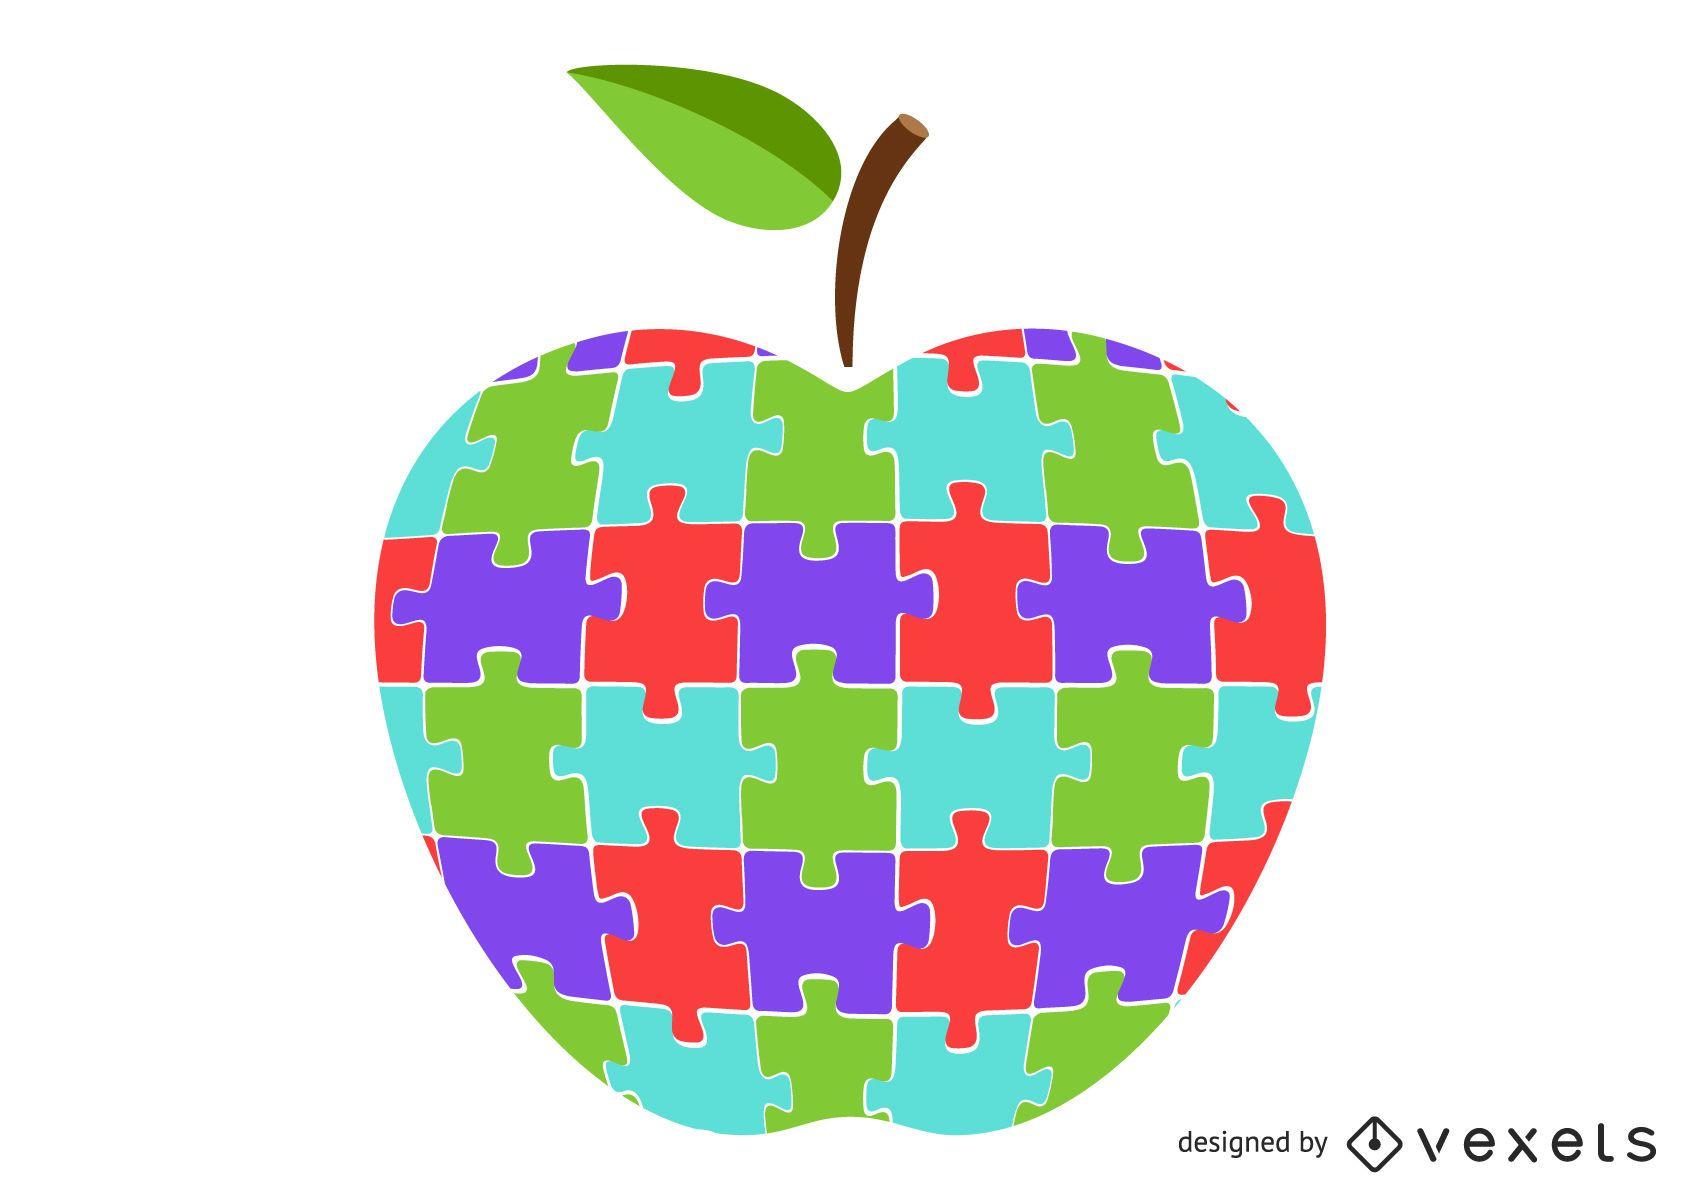 Colorful apple puzzle illustration design